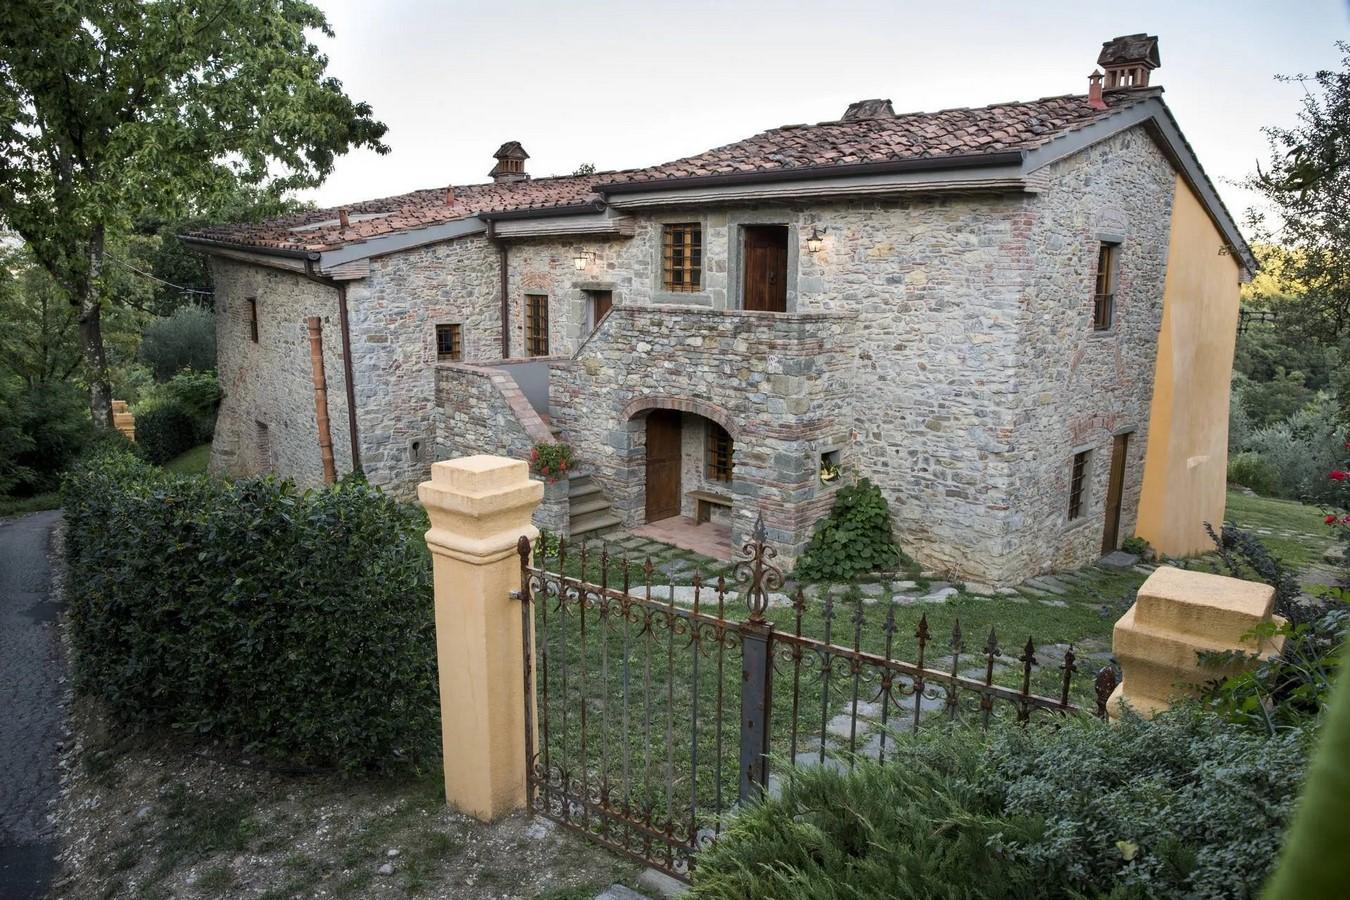 Architects in Prato - Top 20 Architects in Prato - Sheet6